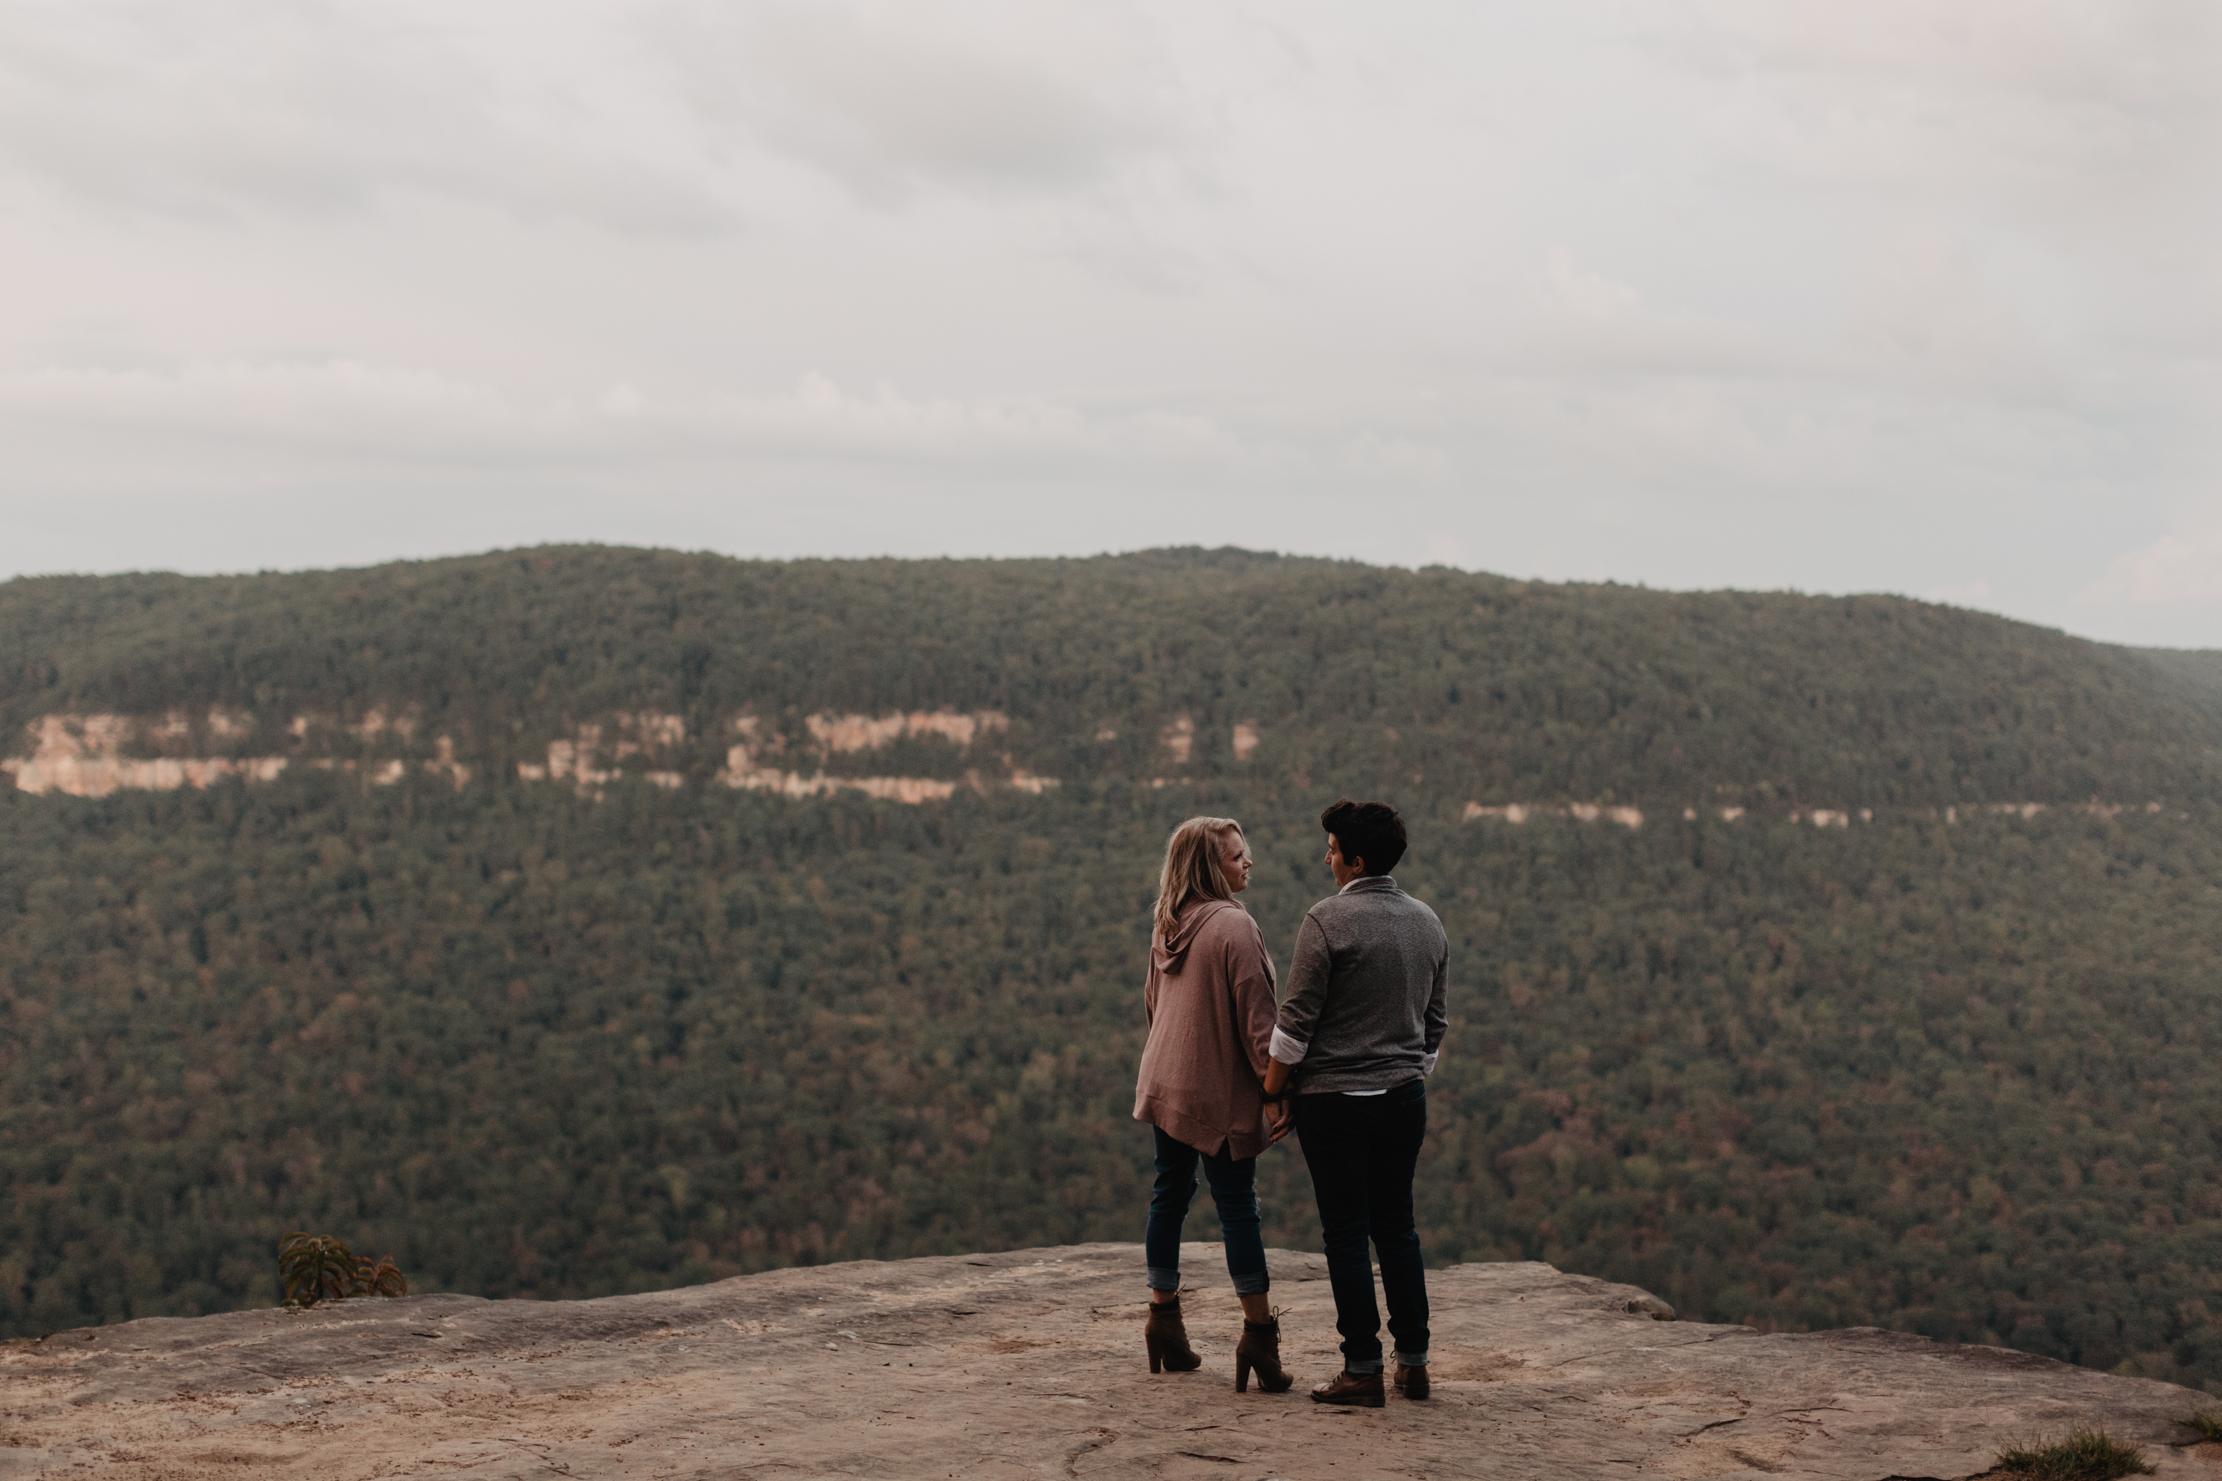 Snoopers Rock Engagement | Chattanooga | Adventure Wedding Photo